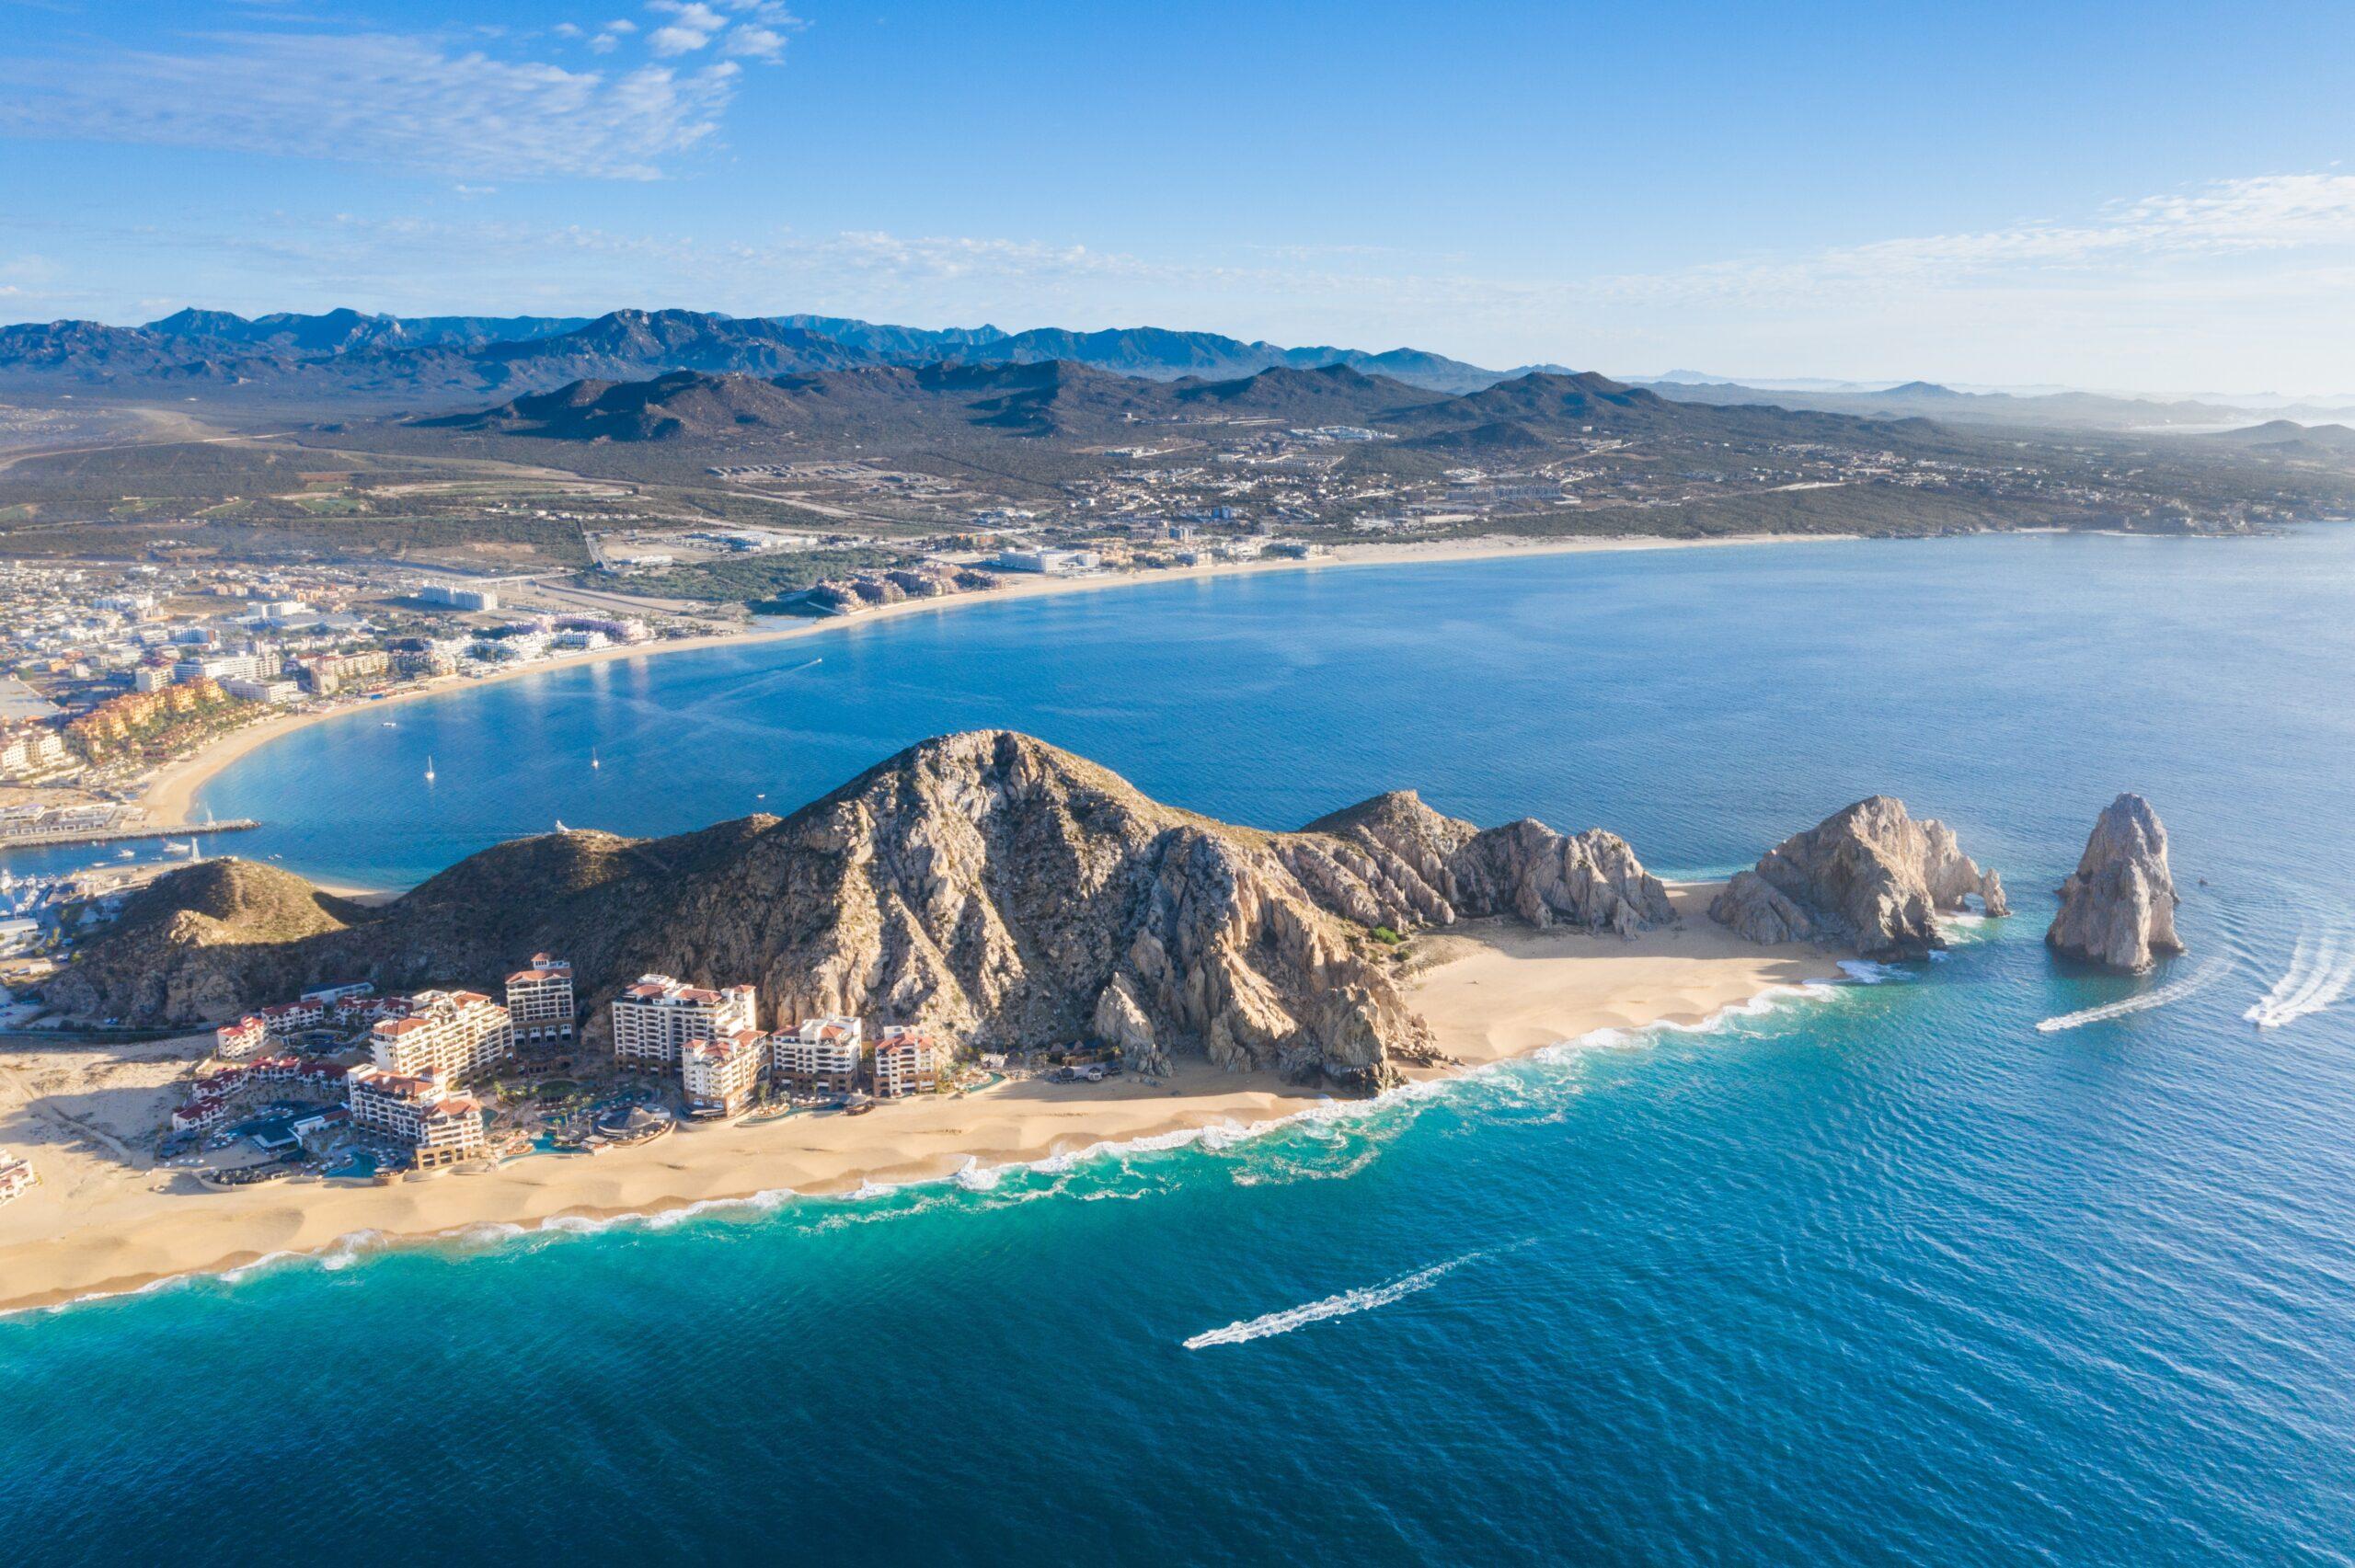 Maleta de Viajes, Hoteles, viajes, turismo, aventura, Baja California Sur, Solmar Hotels & Resorts